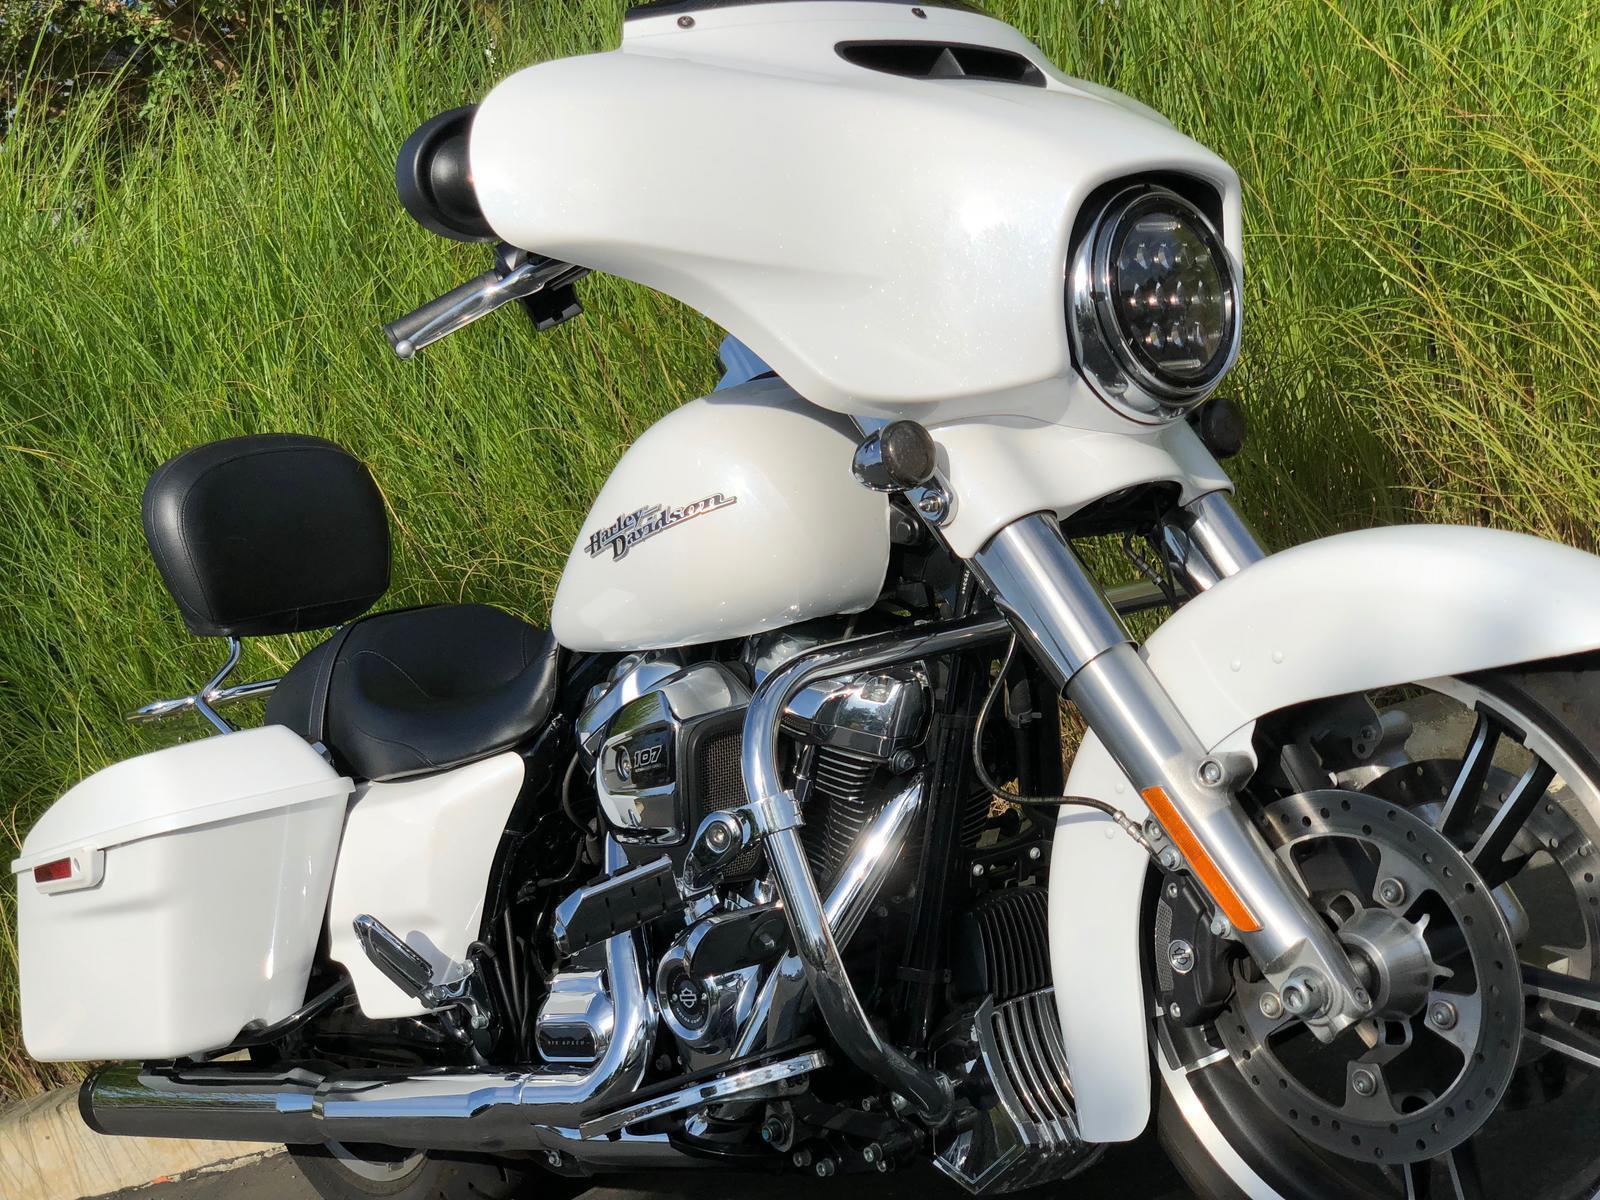 2017 Harley-Davidson® FLHXS Street Glide® Special for sale in